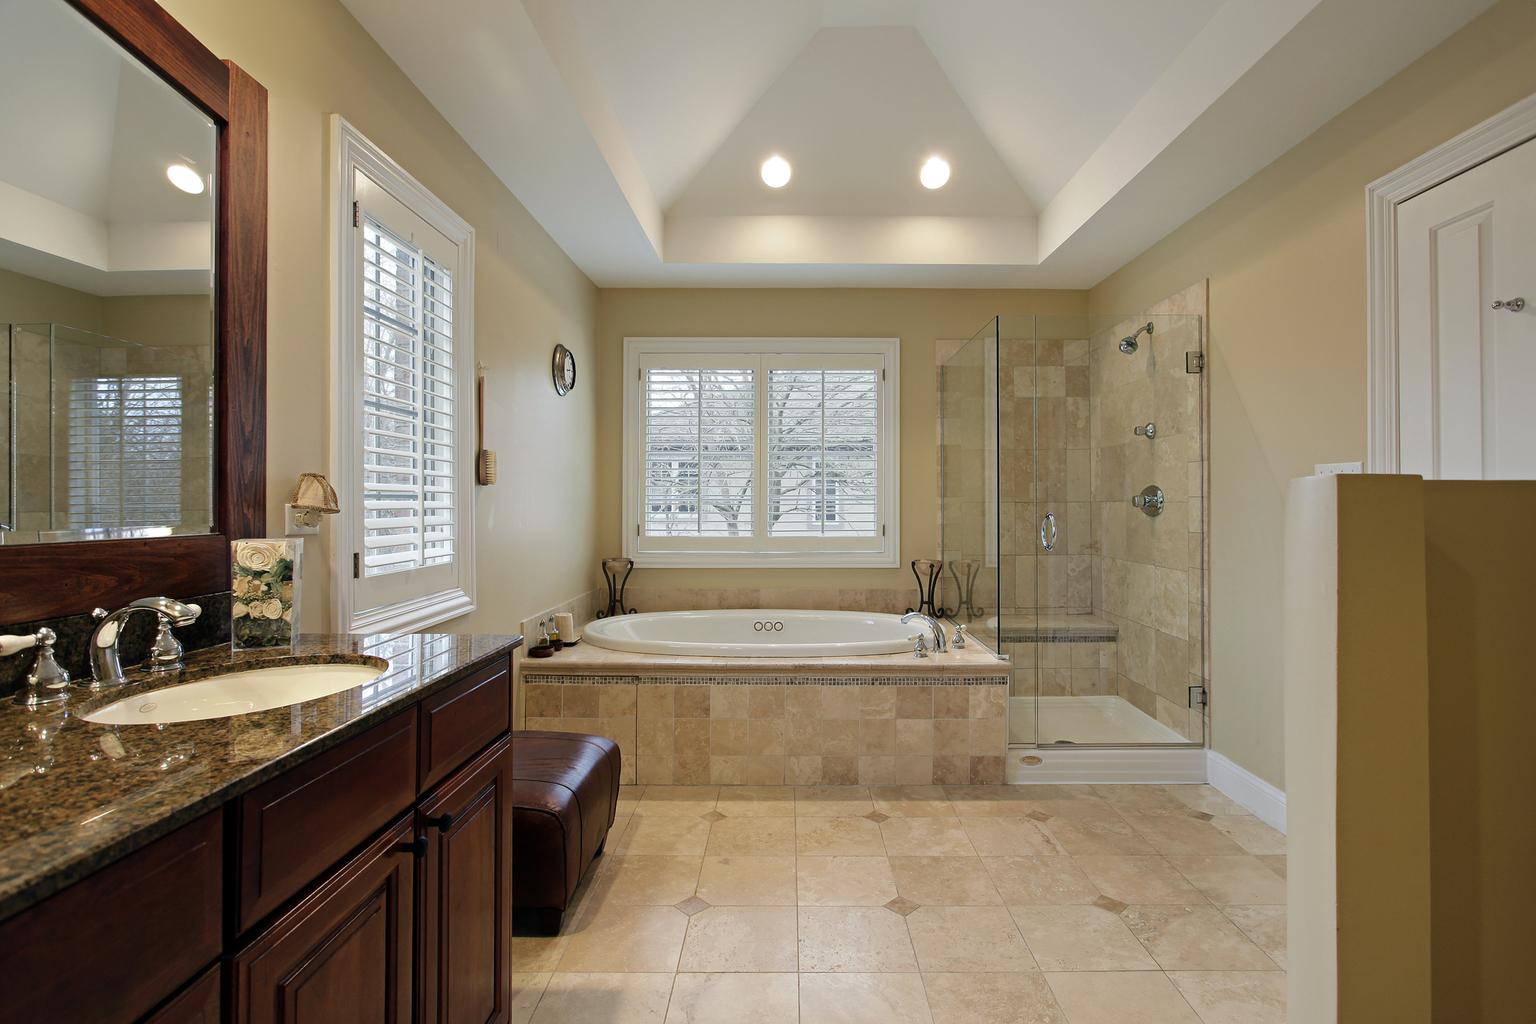 bathroom decor, Home Decorating Tips